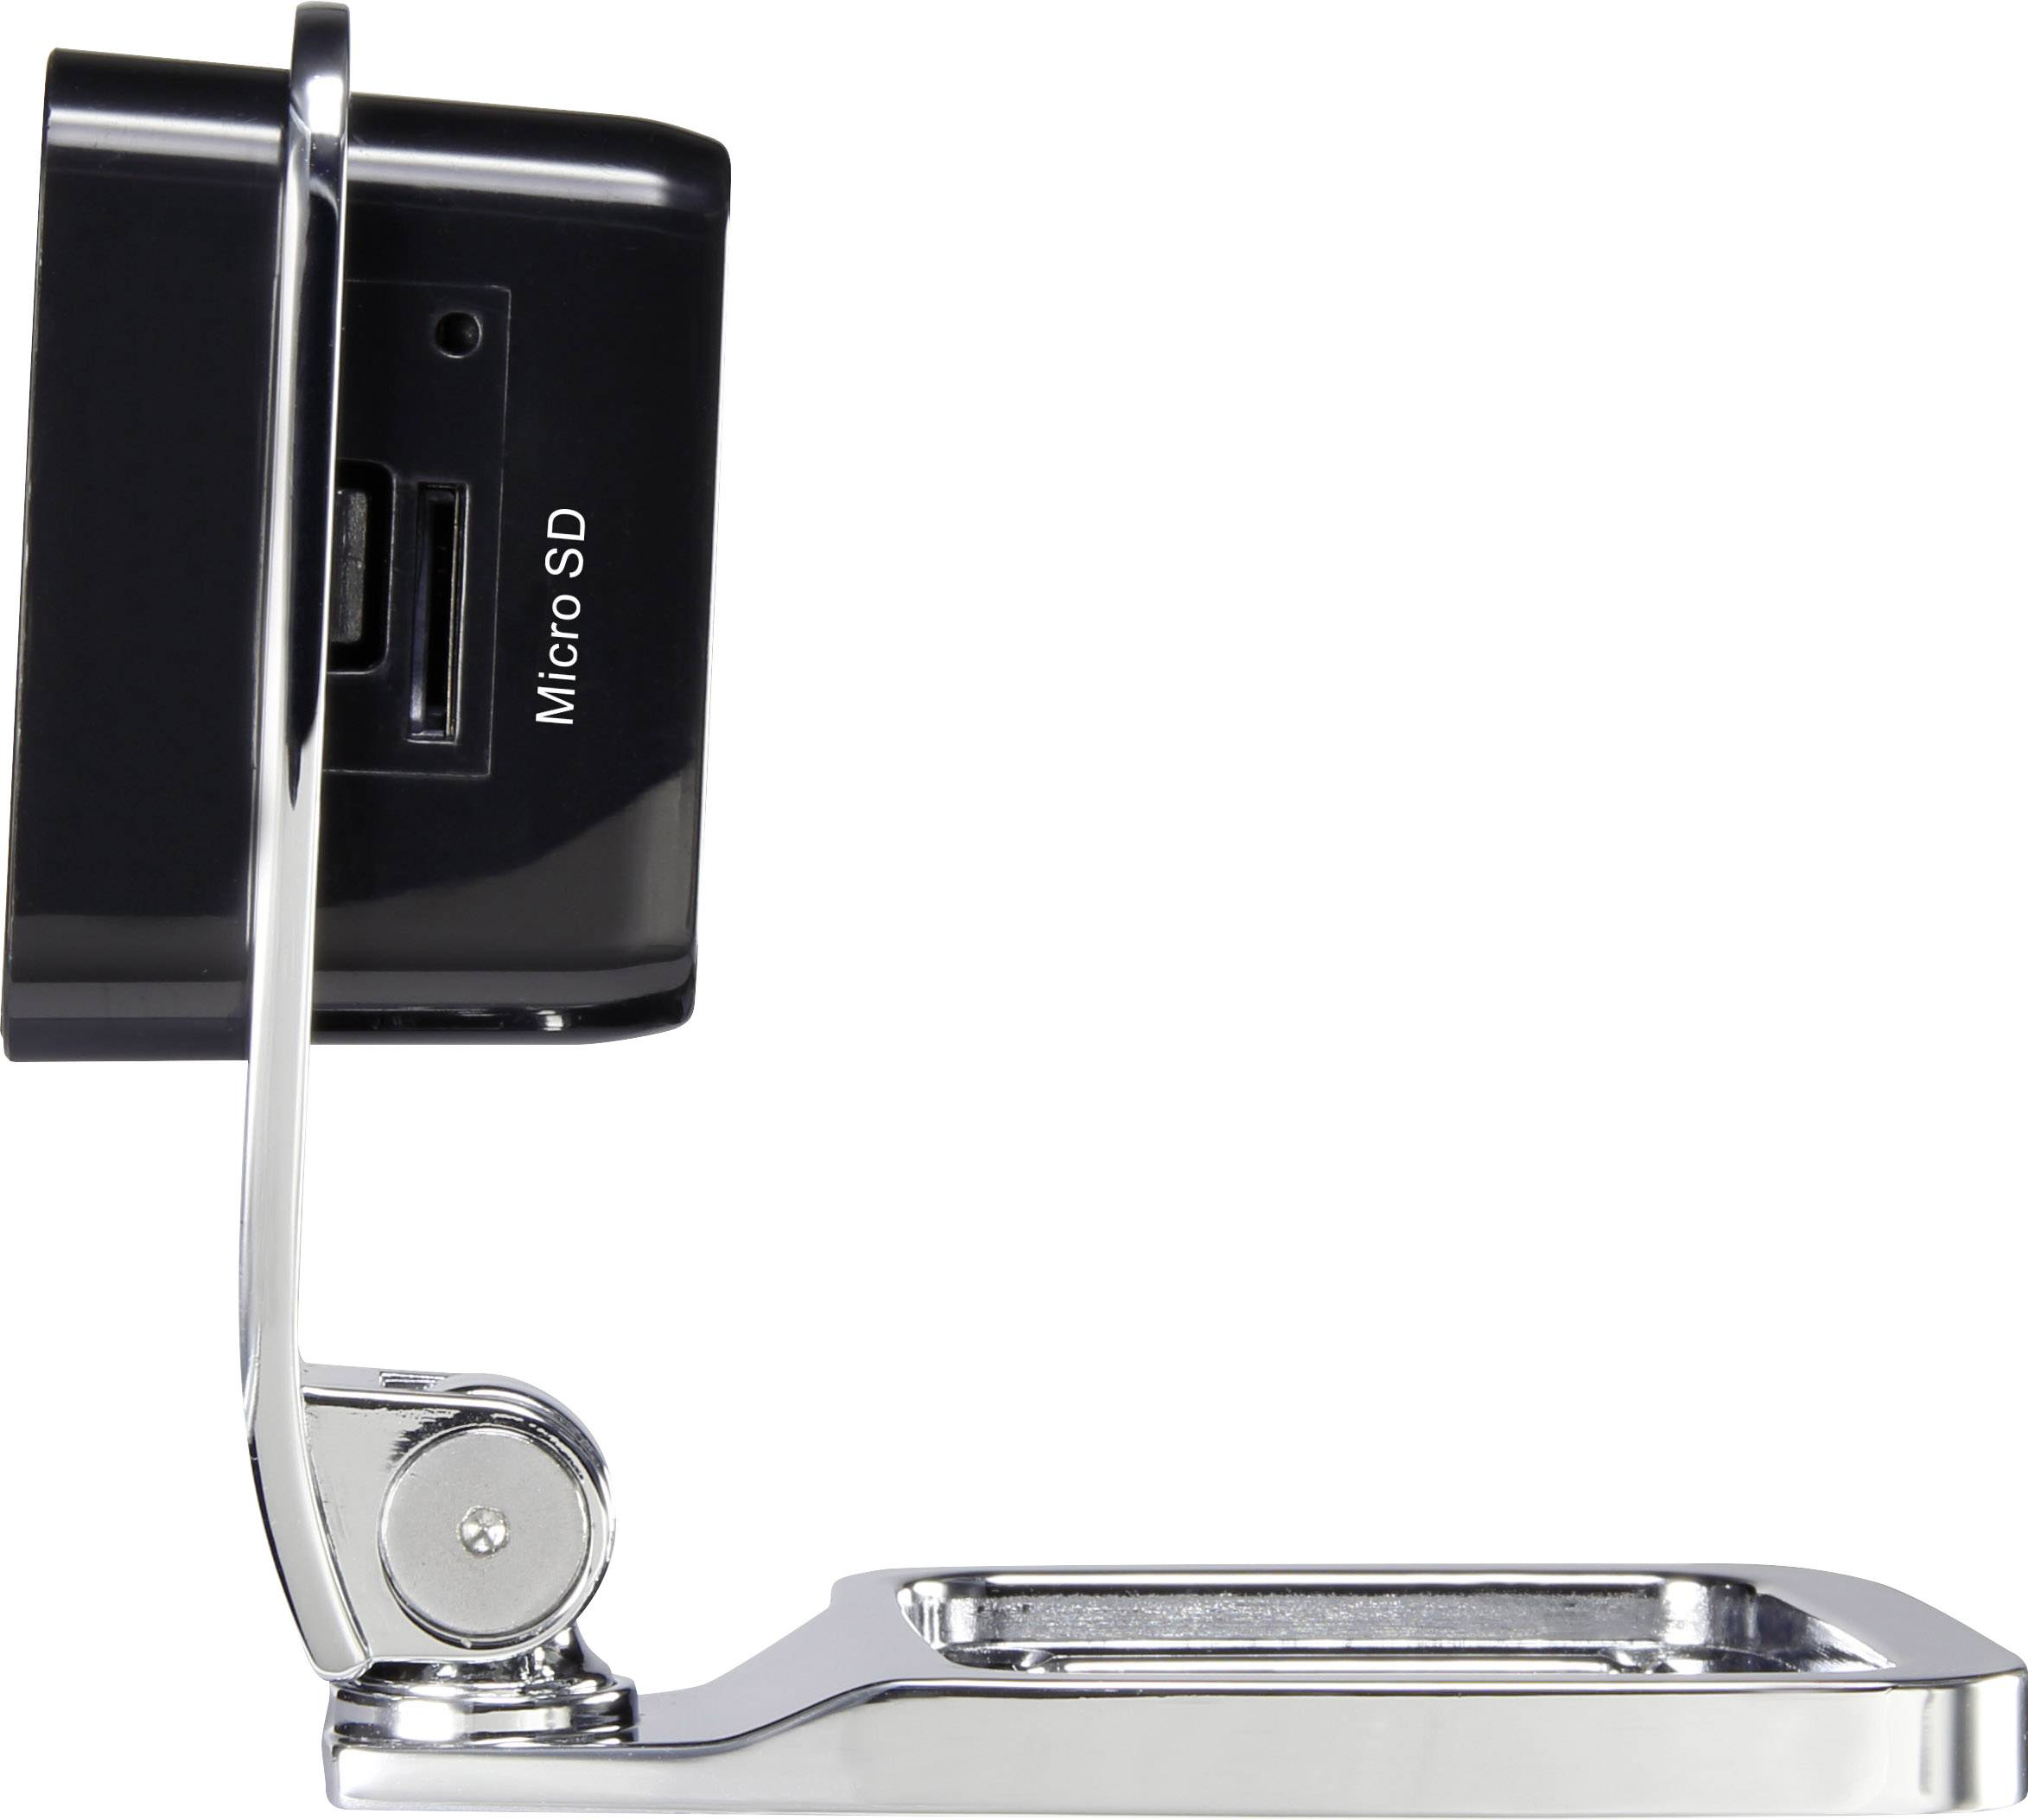 Inteligentná bezpečnostná kamera Sygonix WF-90, s Wi-Fi, 1280 x 720 pix